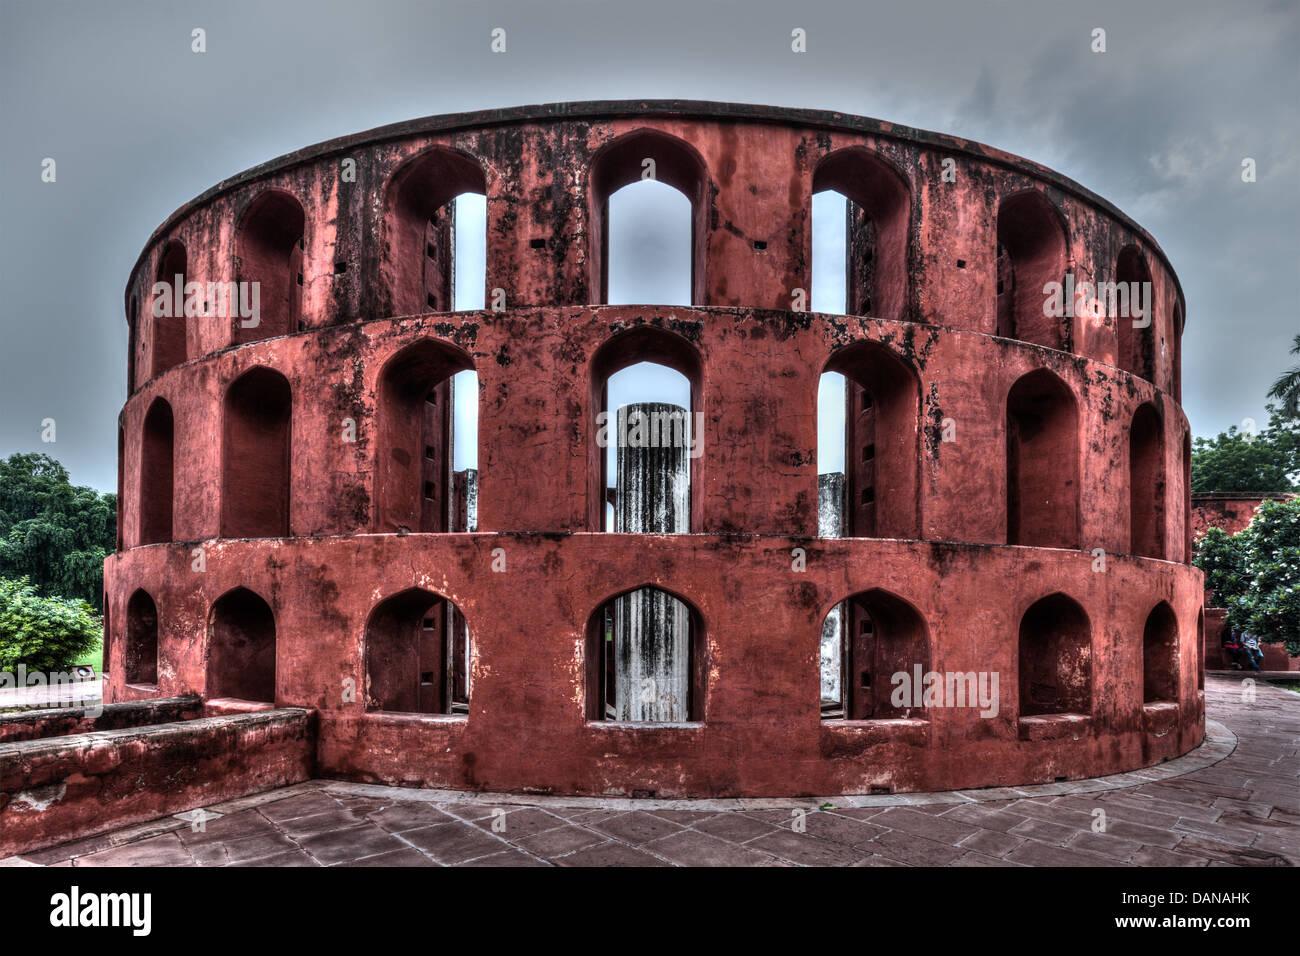 Jantar Mantar - antiguo observatorio con instrumentos de astronomía arquitectónica en Delhi, India Imagen De Stock